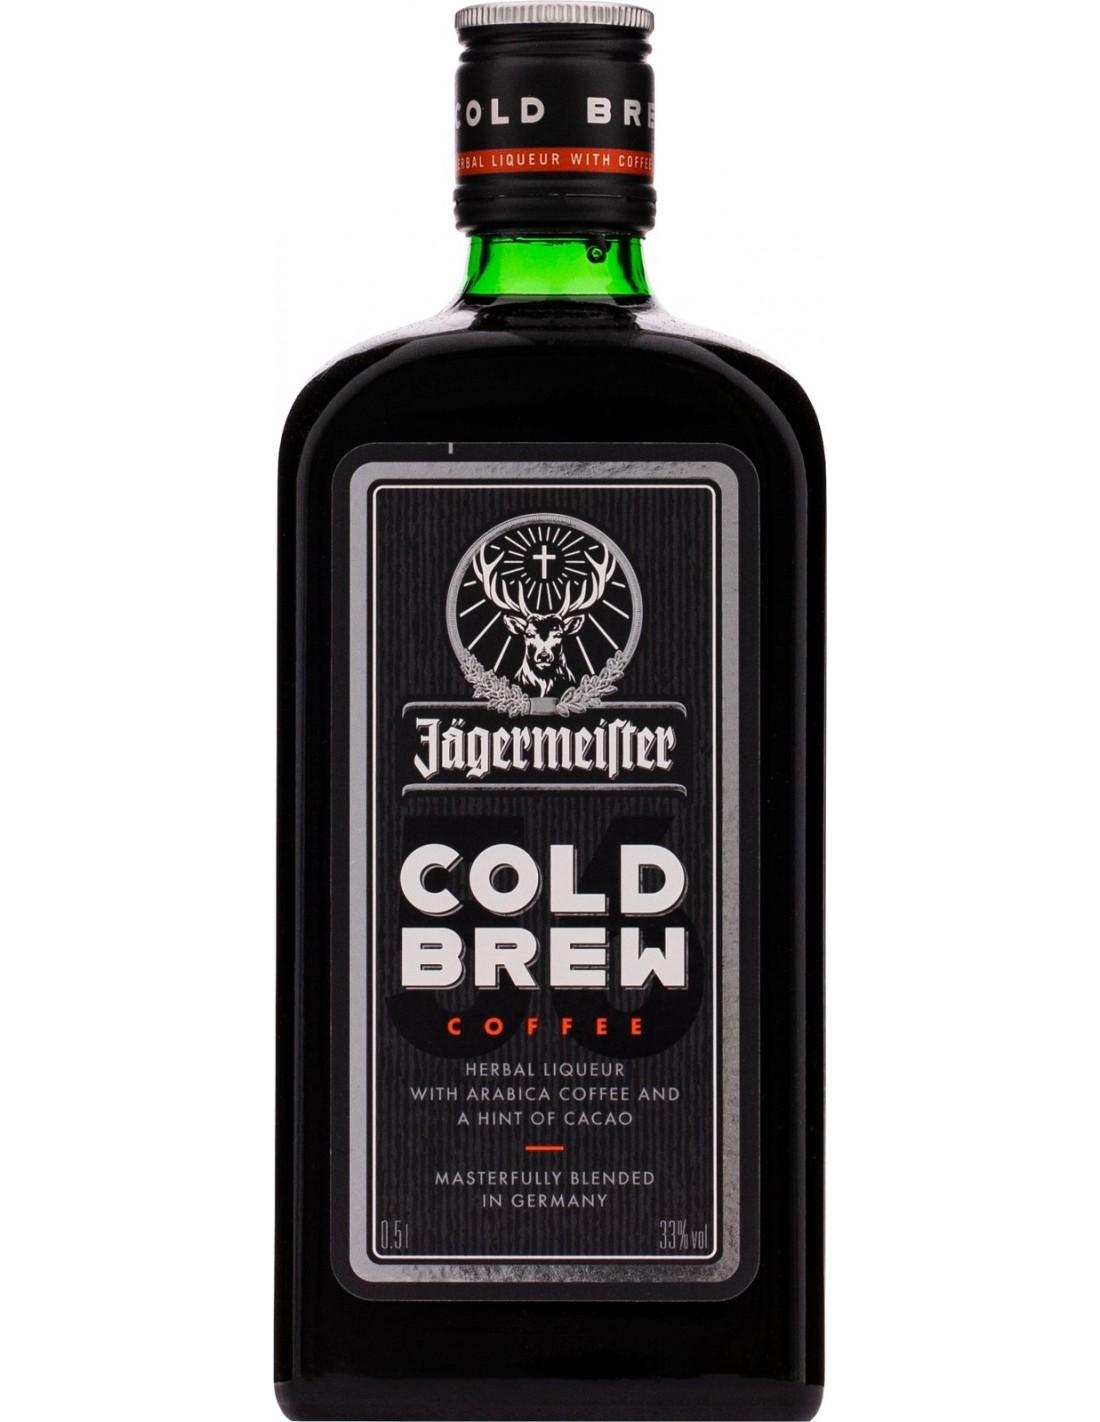 Lichior digestiv Jagermeister Cold Brew, 33% alc., 0.5L, Germania